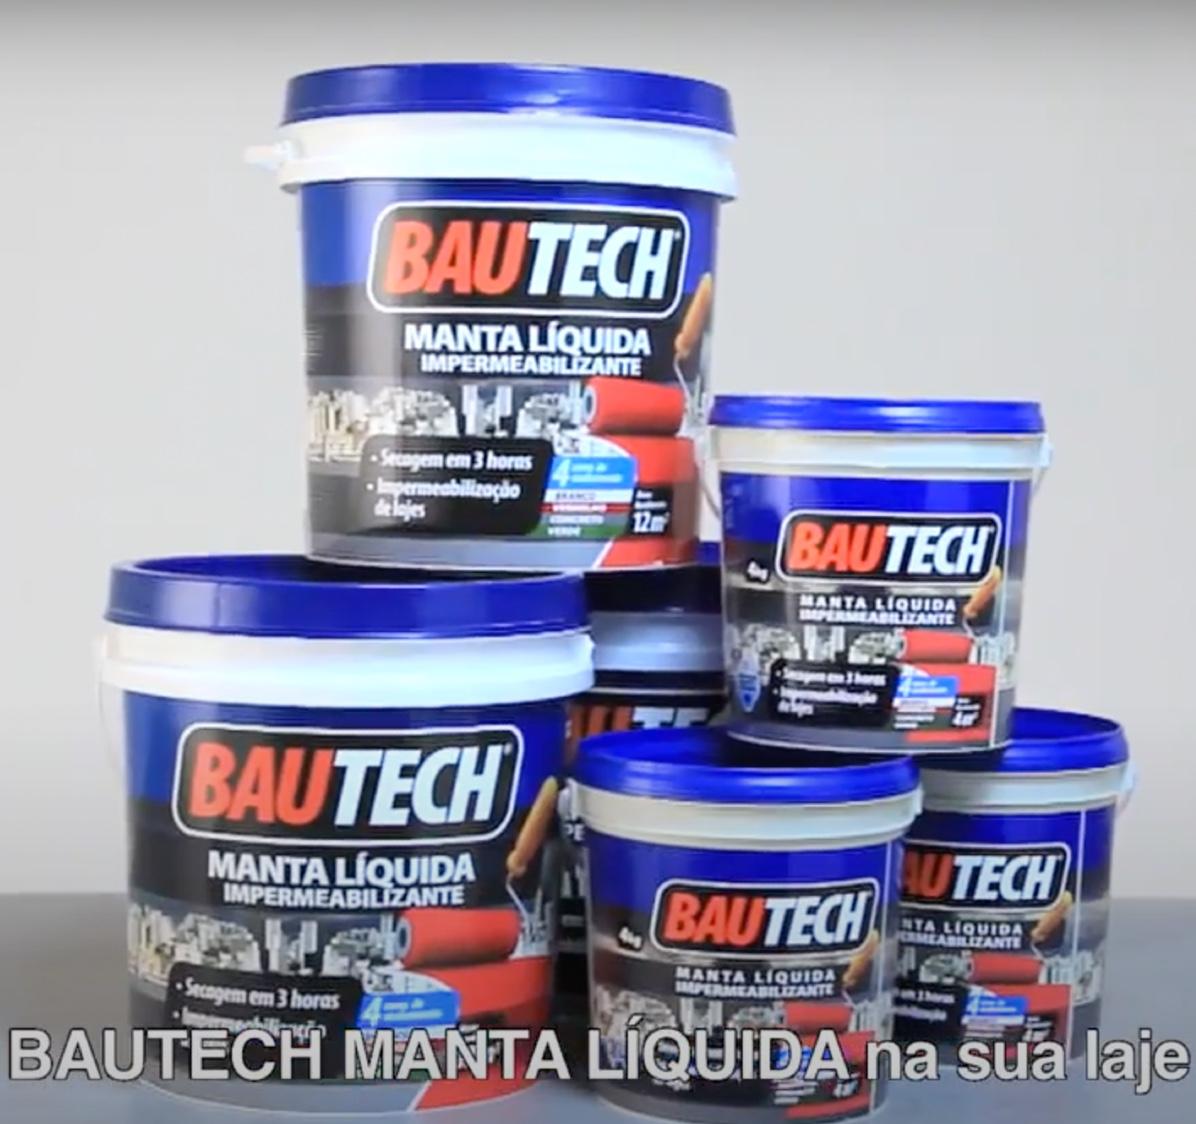 Bautech Manta Liquida 12kg